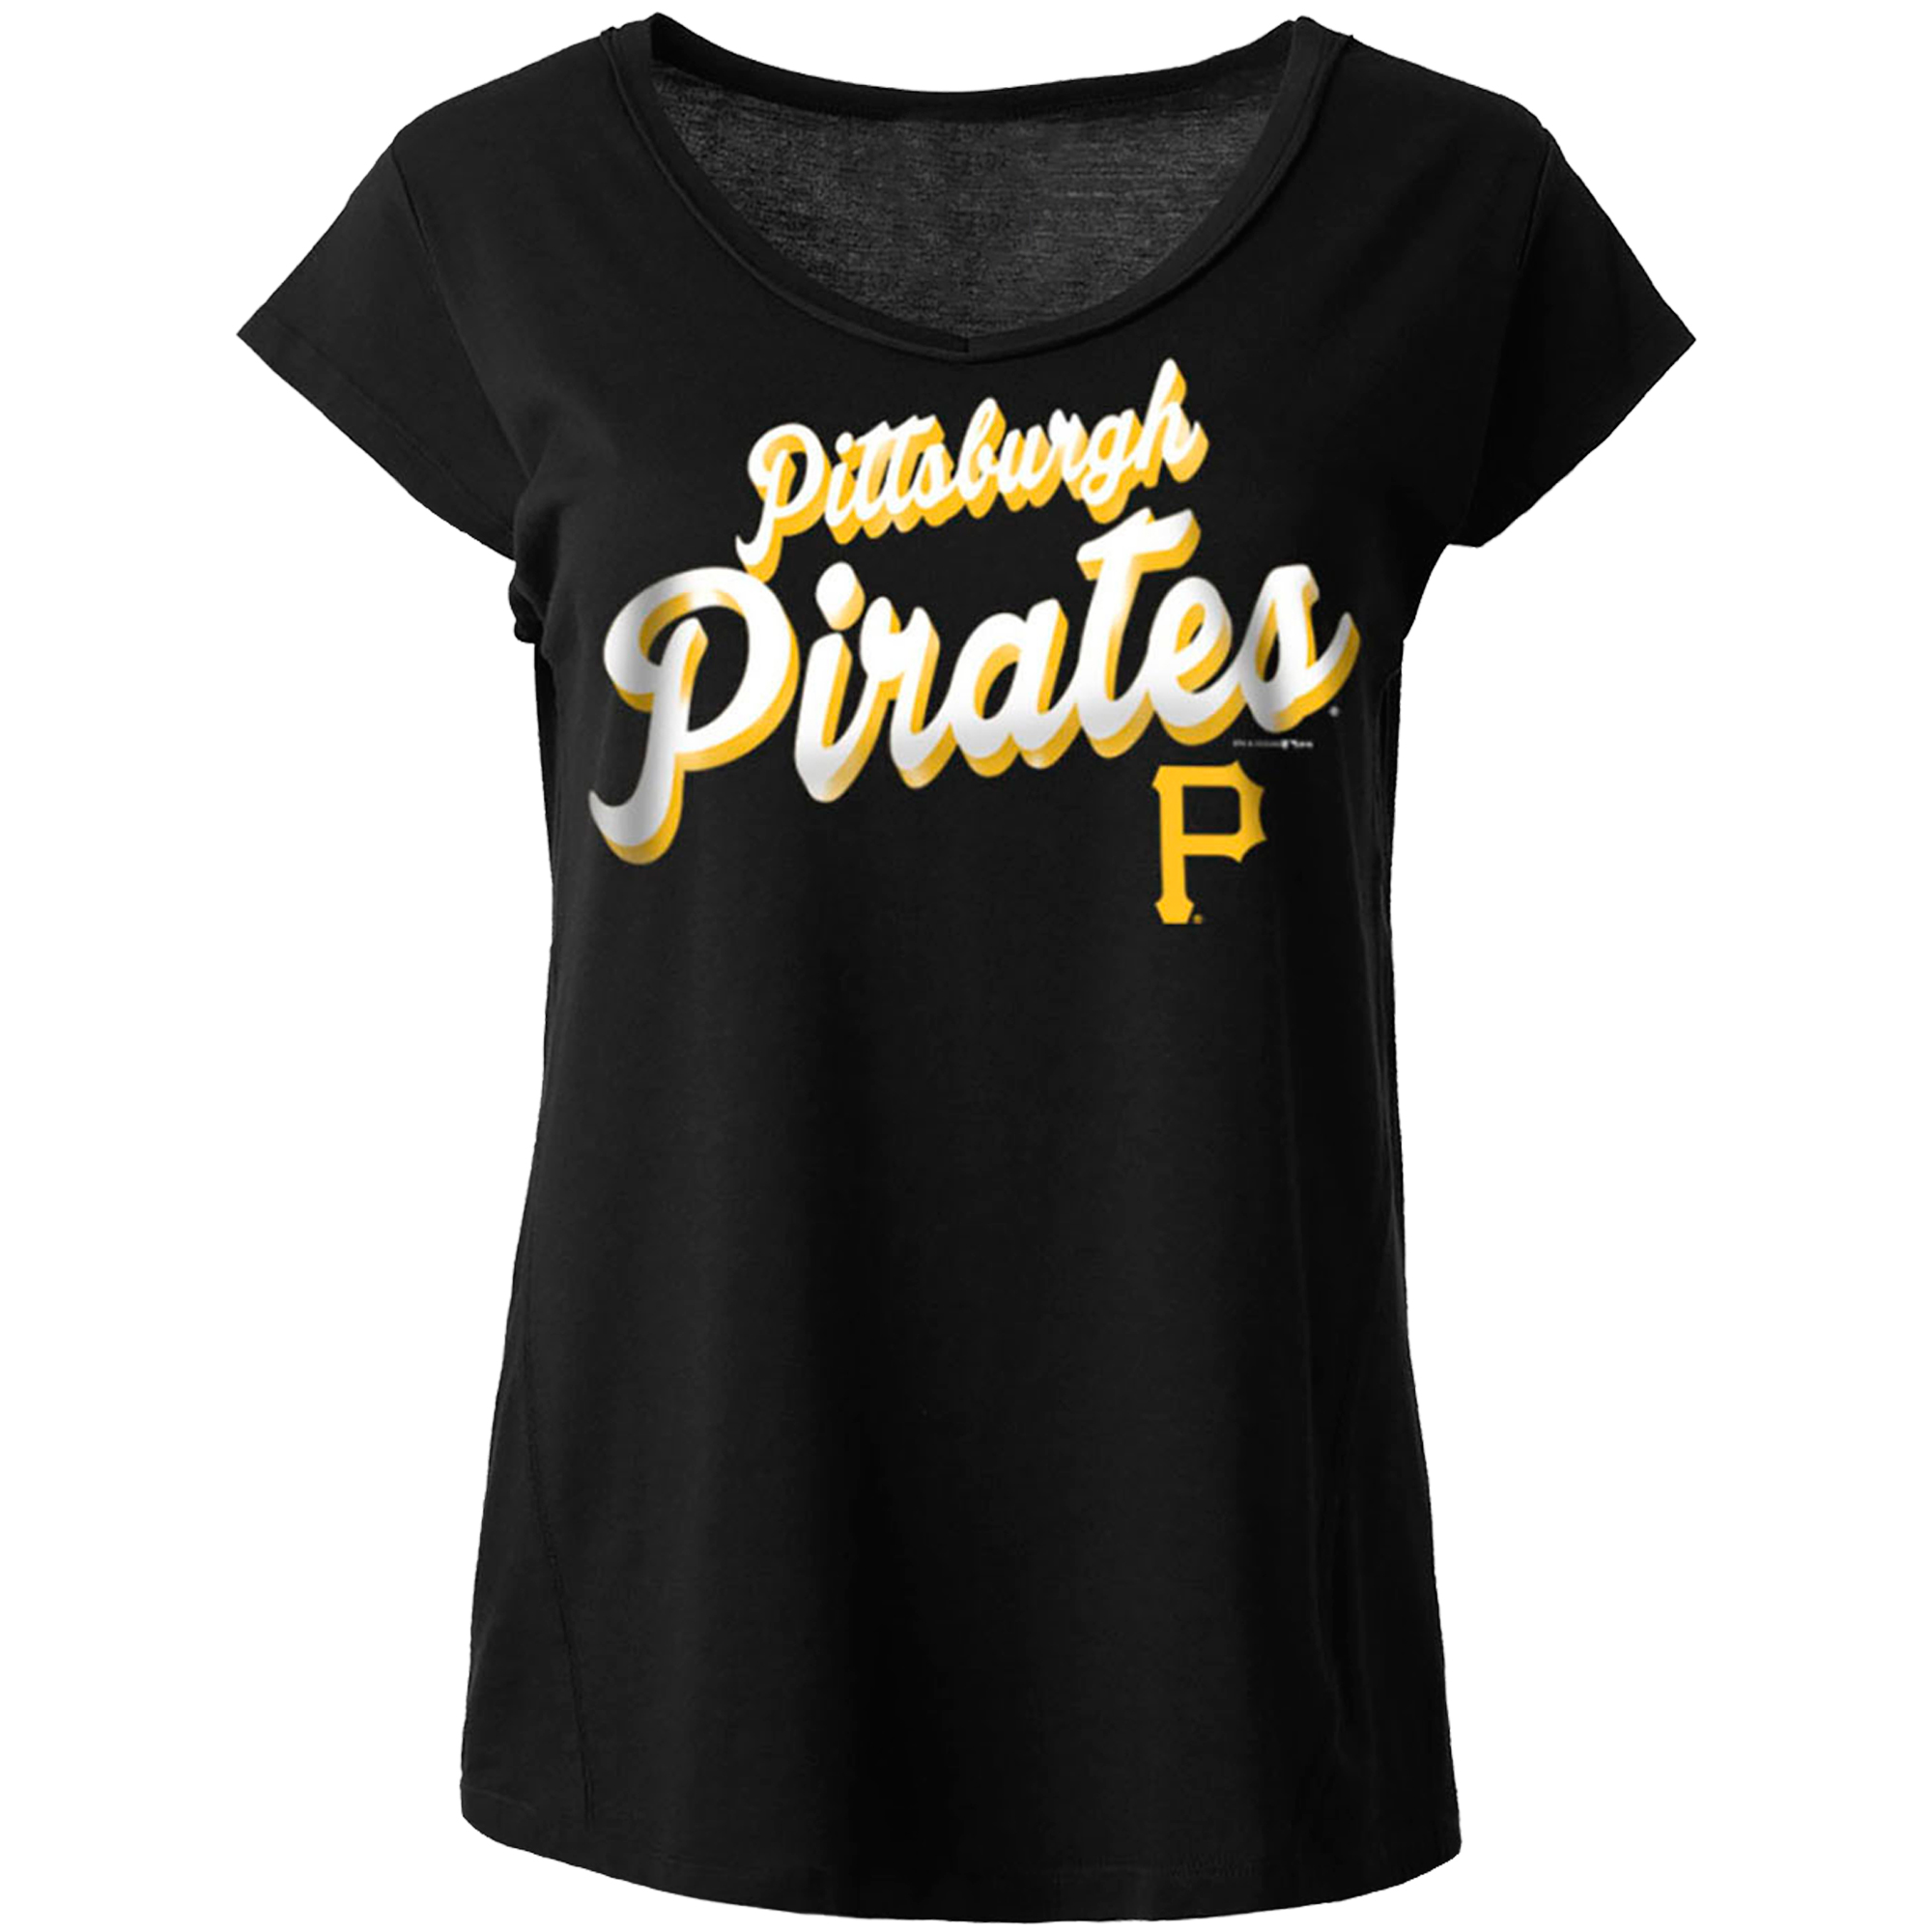 Pittsburgh Pirates 5th & Ocean by New Era Women's Novelty Modal Jersey V-Neck T-Shirt - Black